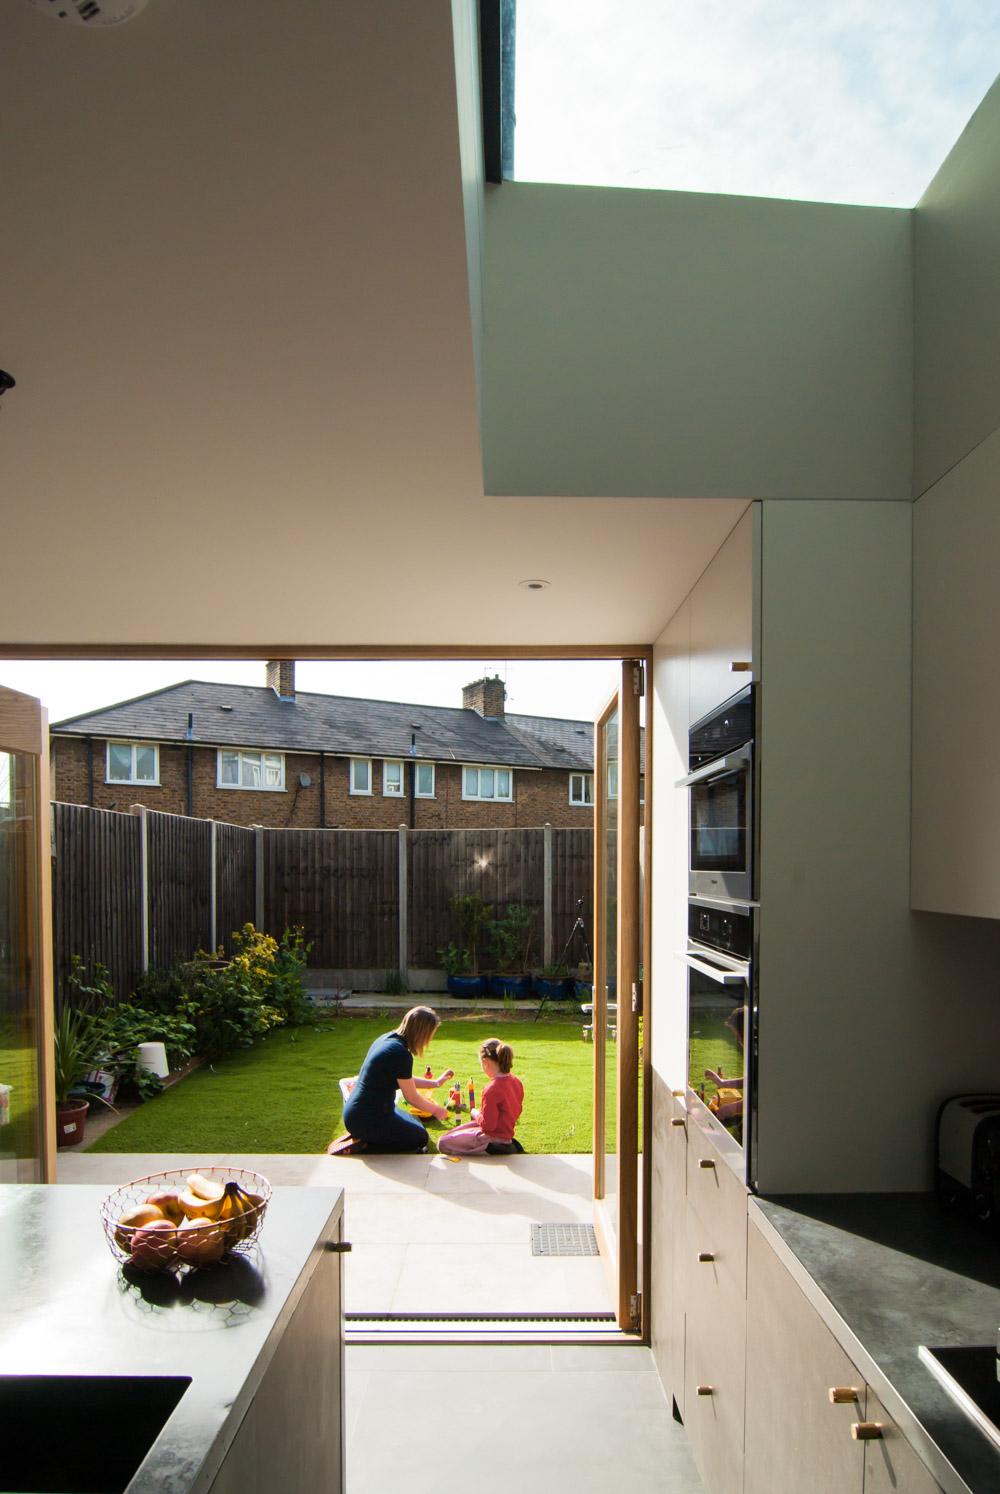 Bespoke oak bi-fold door patio black mdf concreto strata tile Buster+punch handles